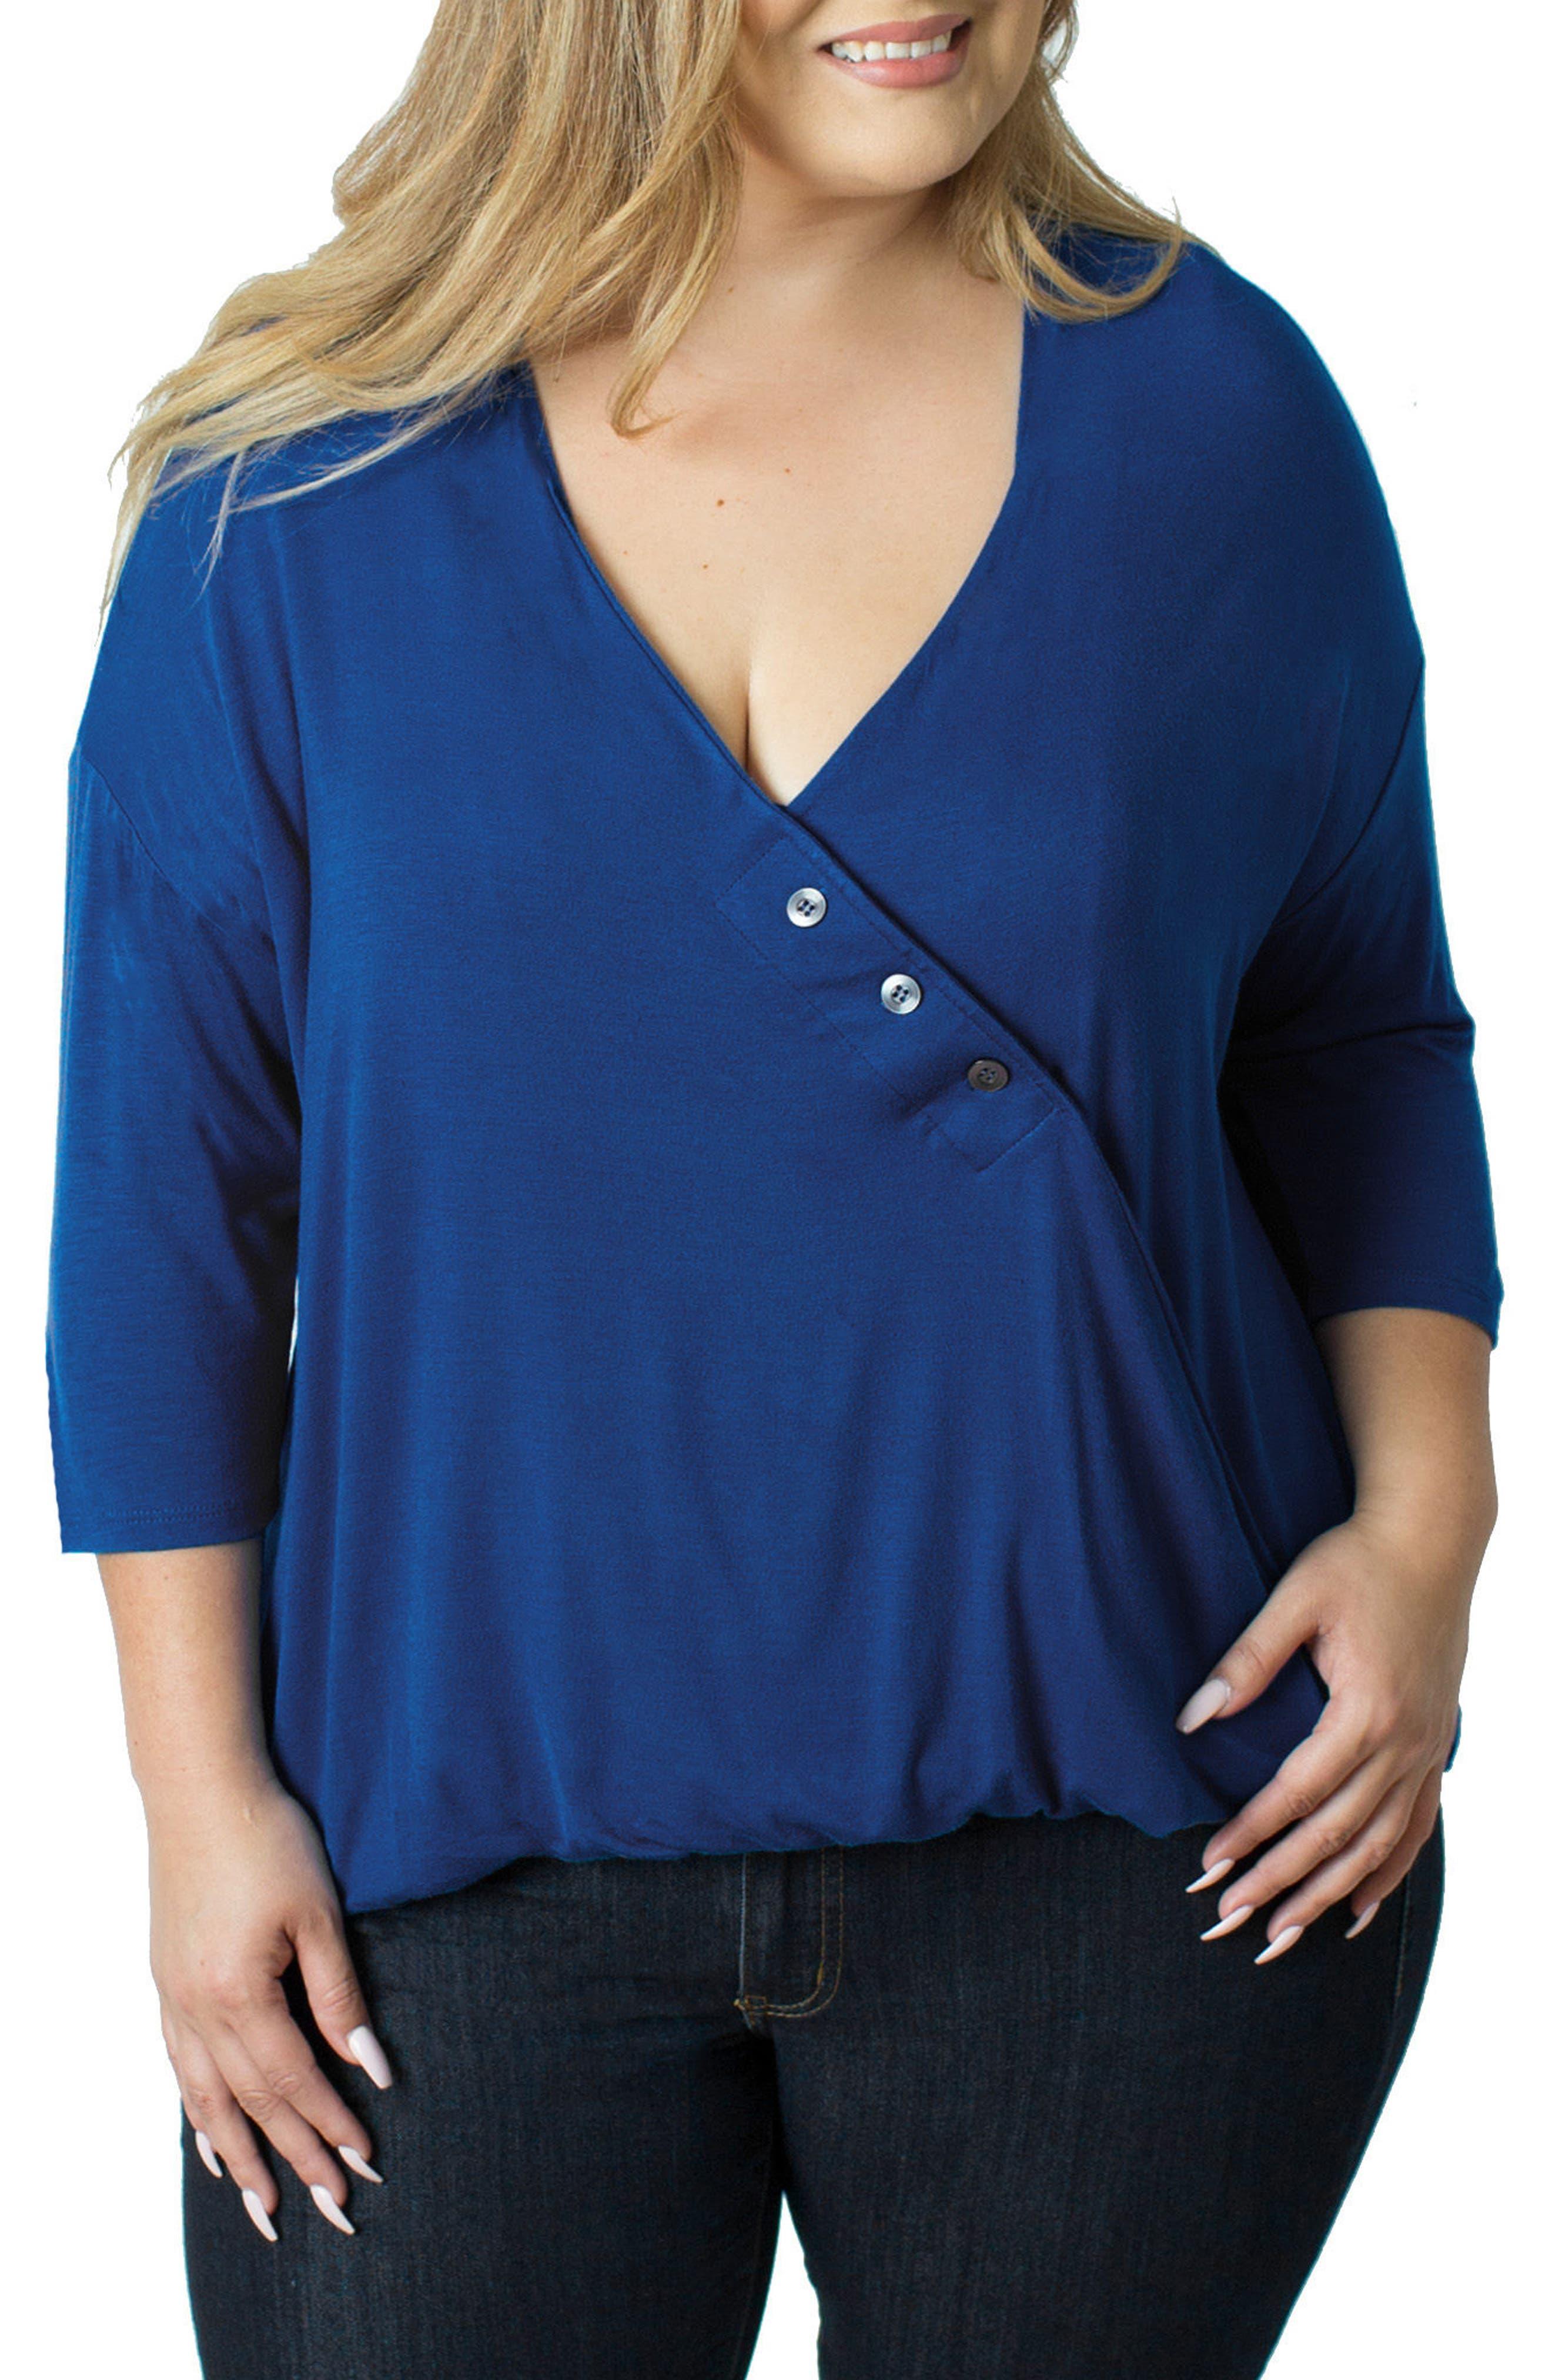 Alternate Image 1 Selected - Udderly Hot Mama Button V-Neck Nursing Top (Plus Size)